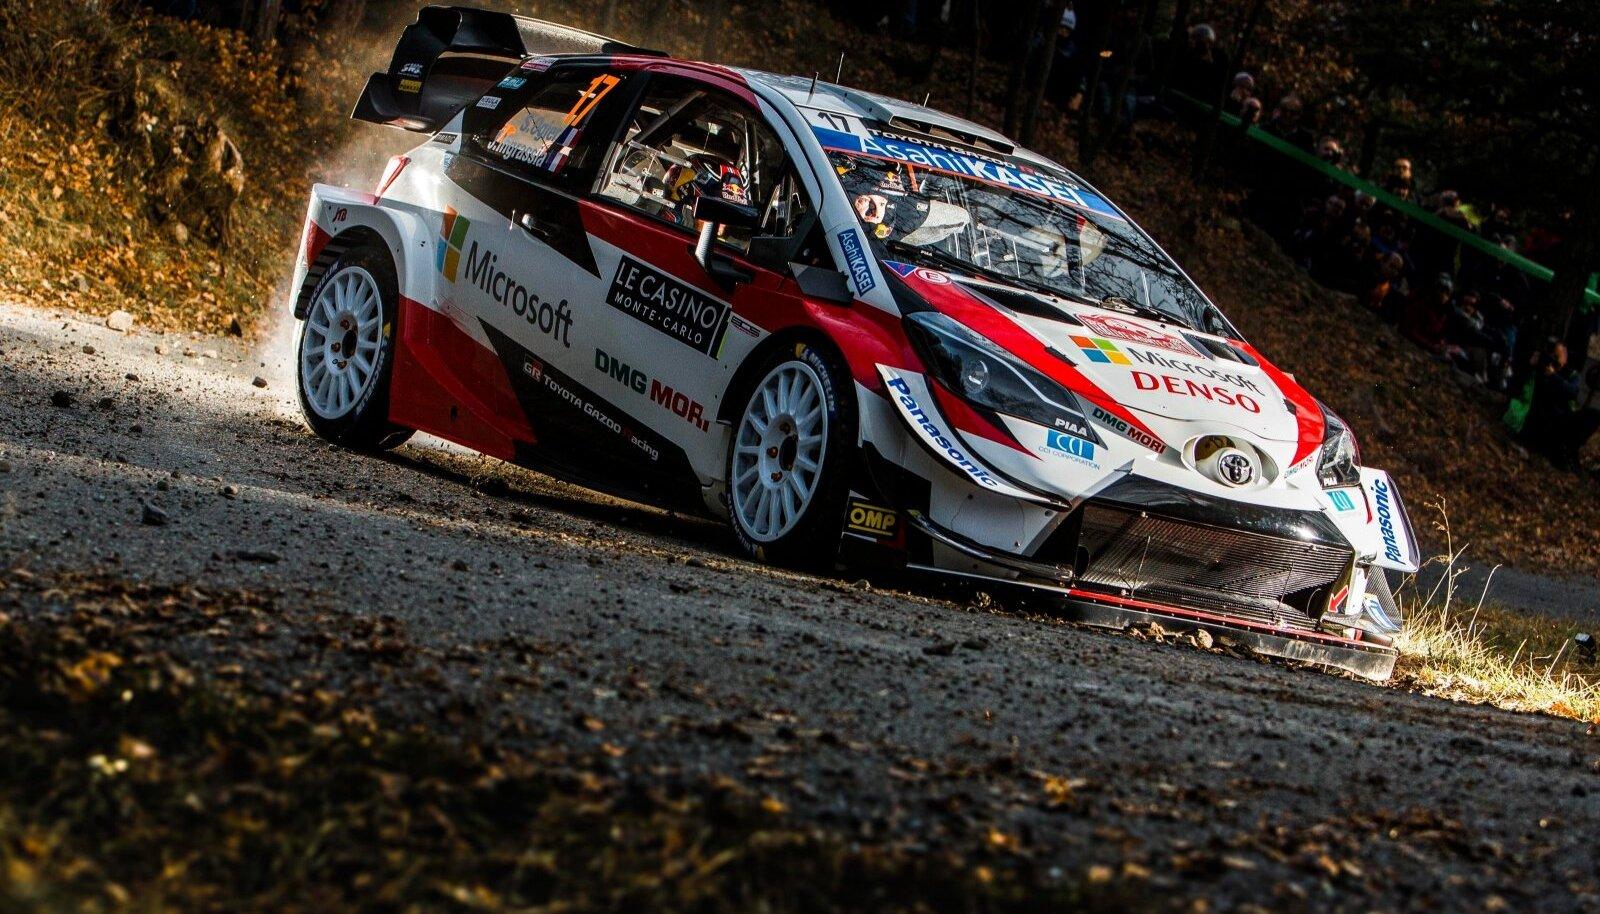 Sebastien Ogier (FRA) Ð Julien Ingrassia (FRA) - Toyota AUTOMOBILE : Rallye de Monte Carlo WRC, Motorsport Rallye, WM -